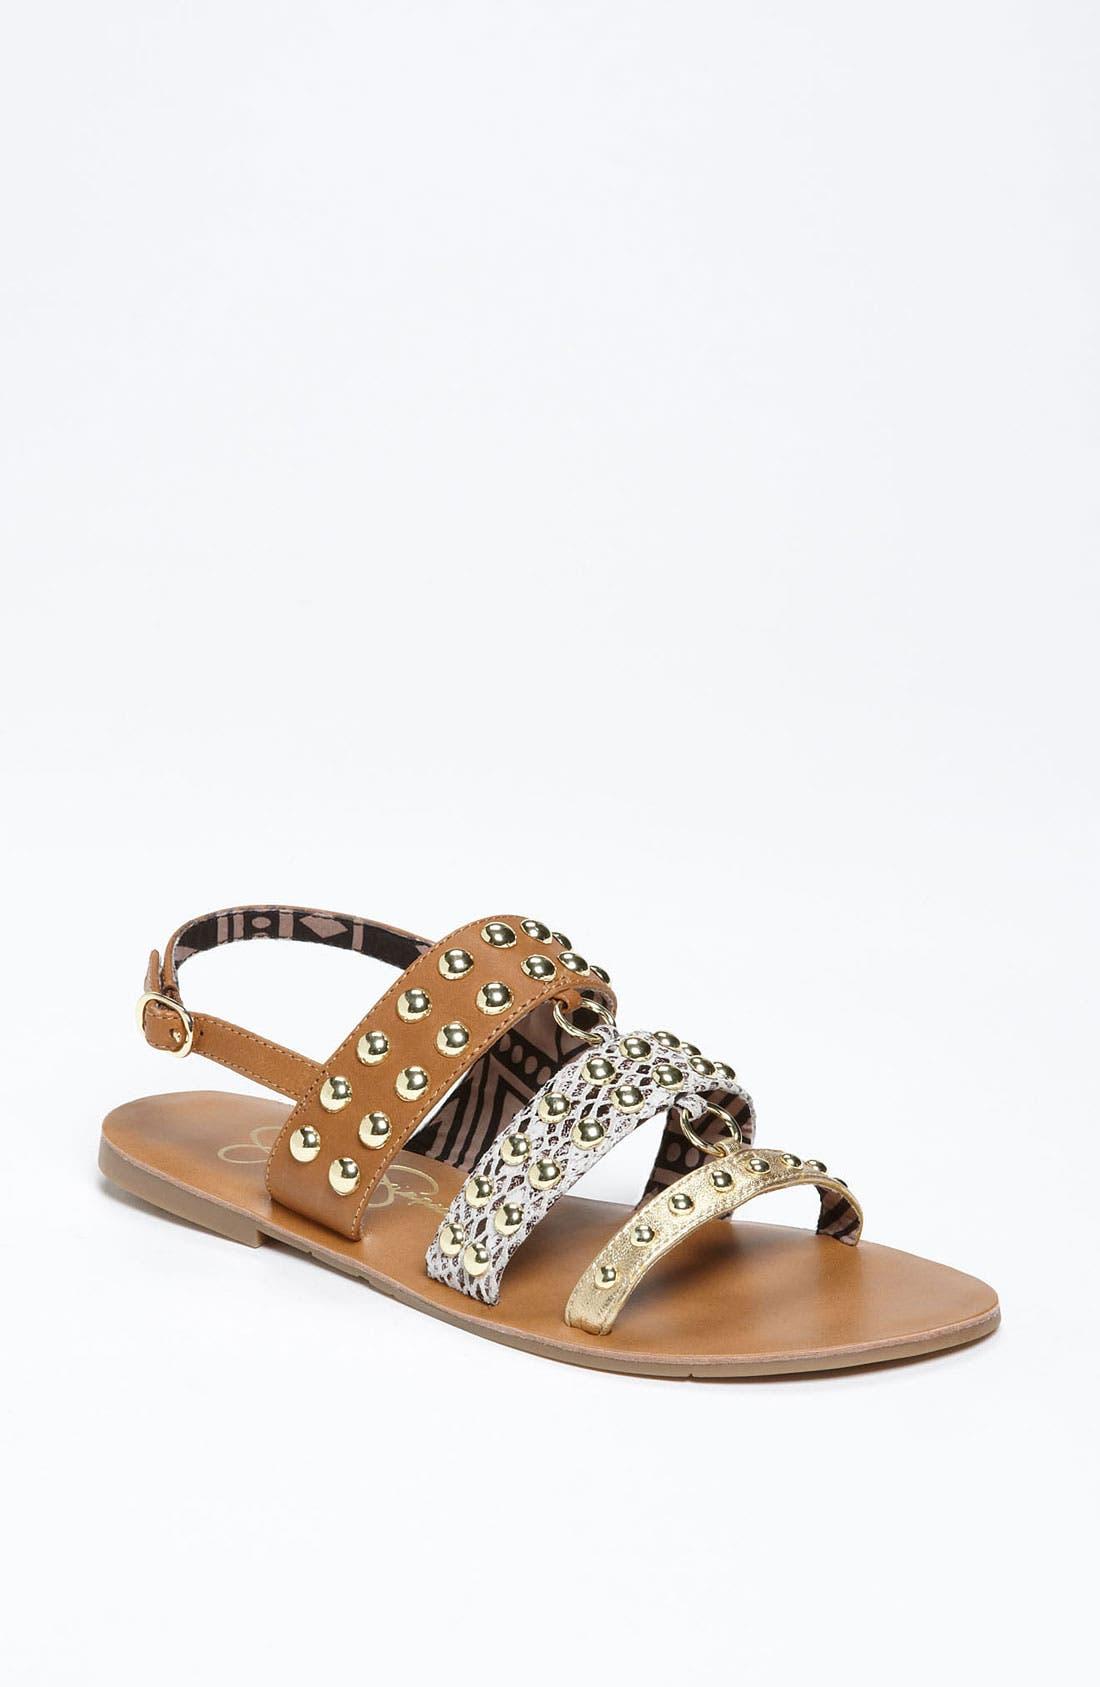 Alternate Image 1 Selected - Jessica Simpson 'Kari' Sandal